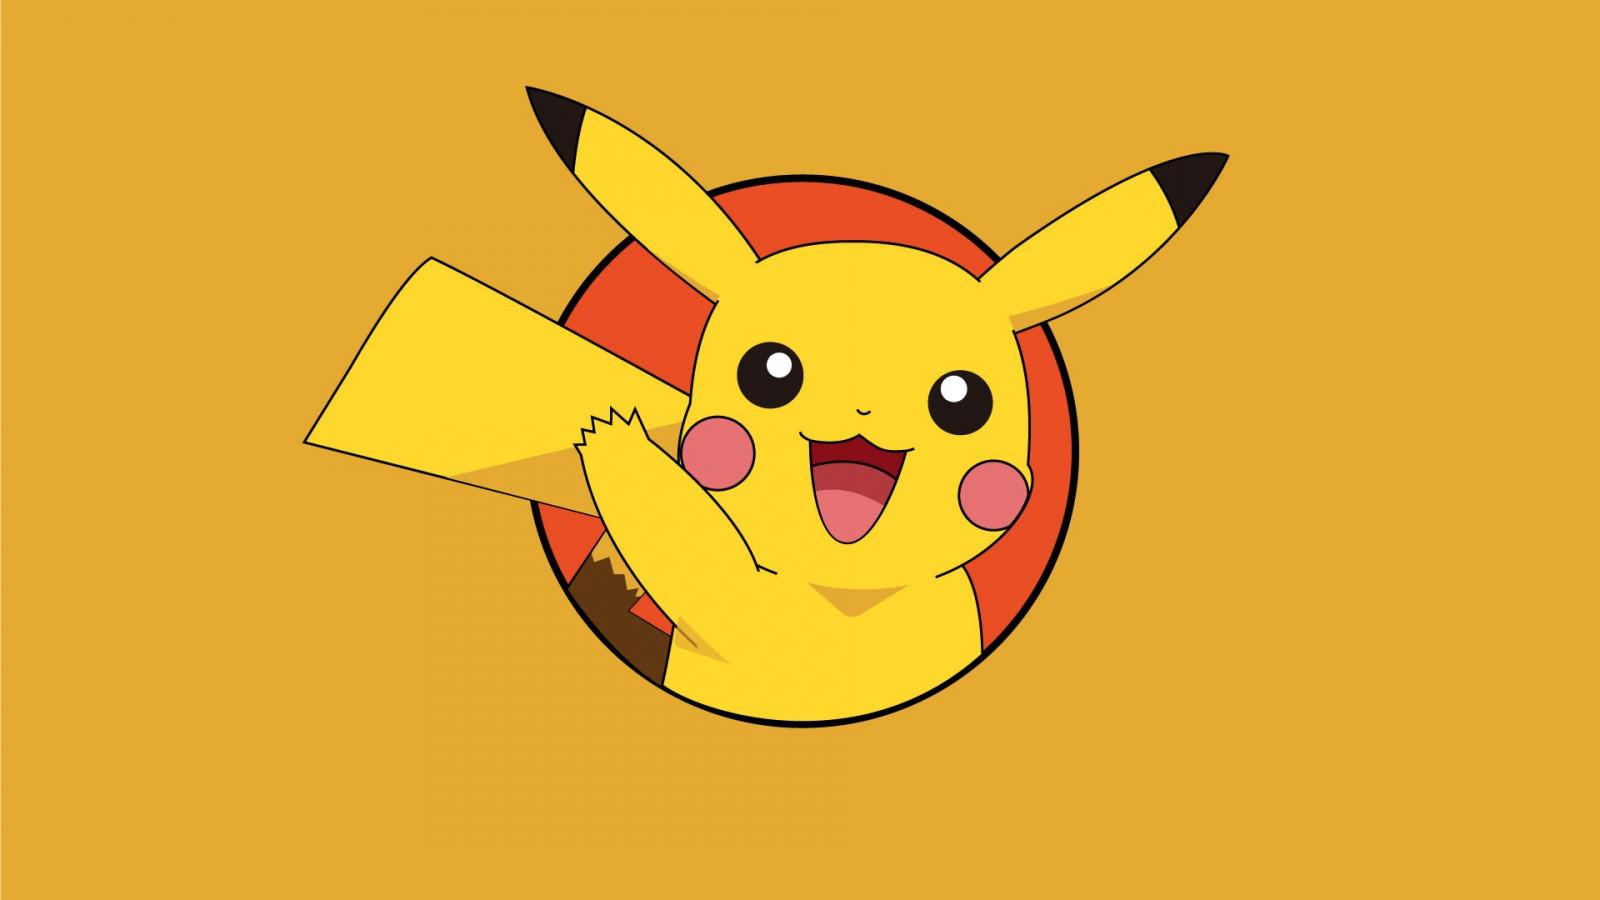 Fond d 39 cran illustration anime logo jaune dessin - Pikachu dessin anime ...